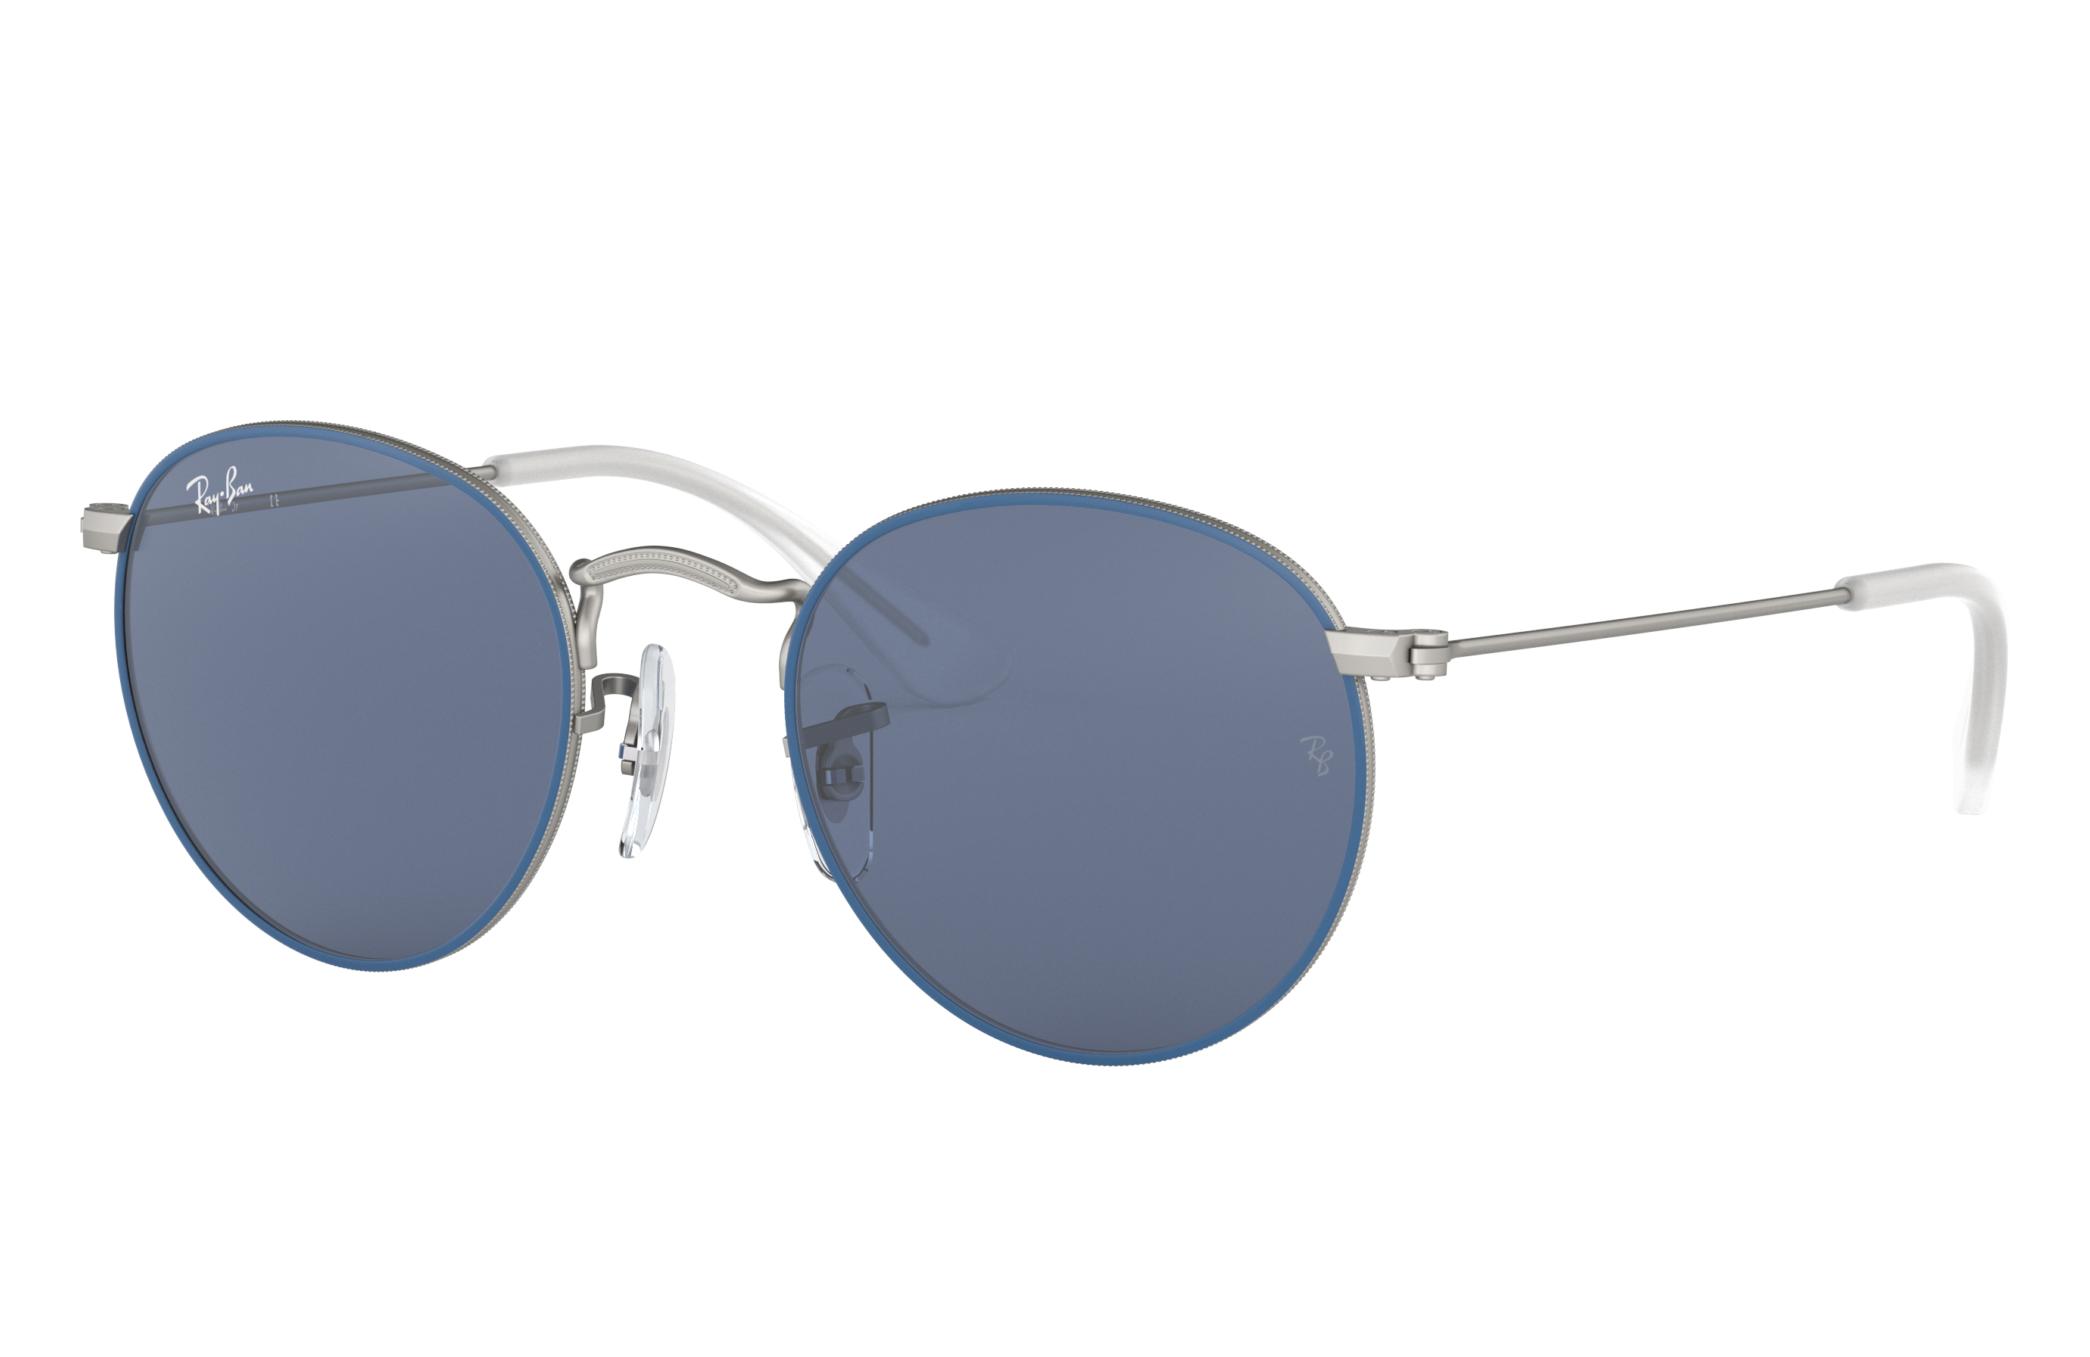 Ray-Ban Round Metal Junior Silver, Blue Lenses - RJ9547S